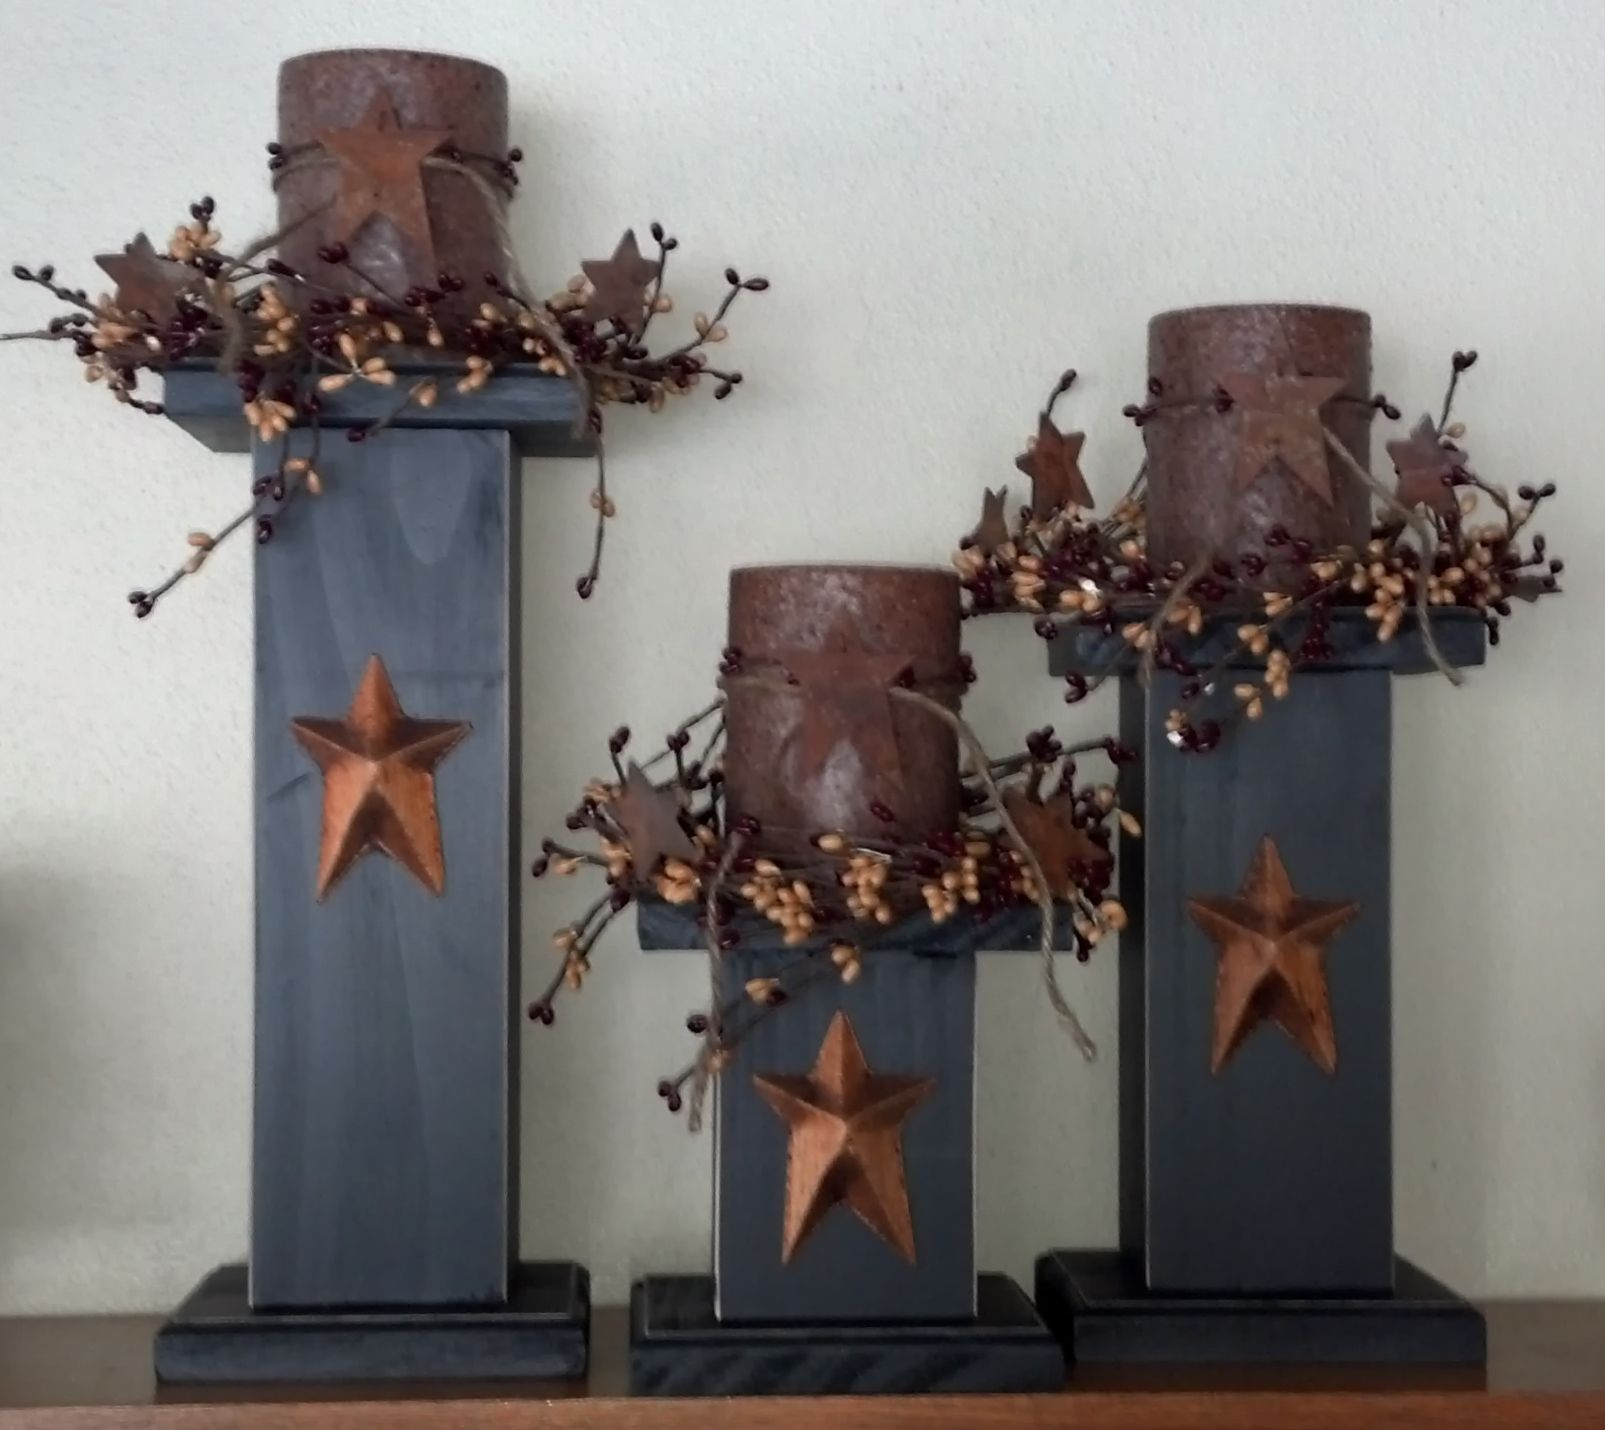 Primitives Home Decor: Primitive Candle Stick Holders